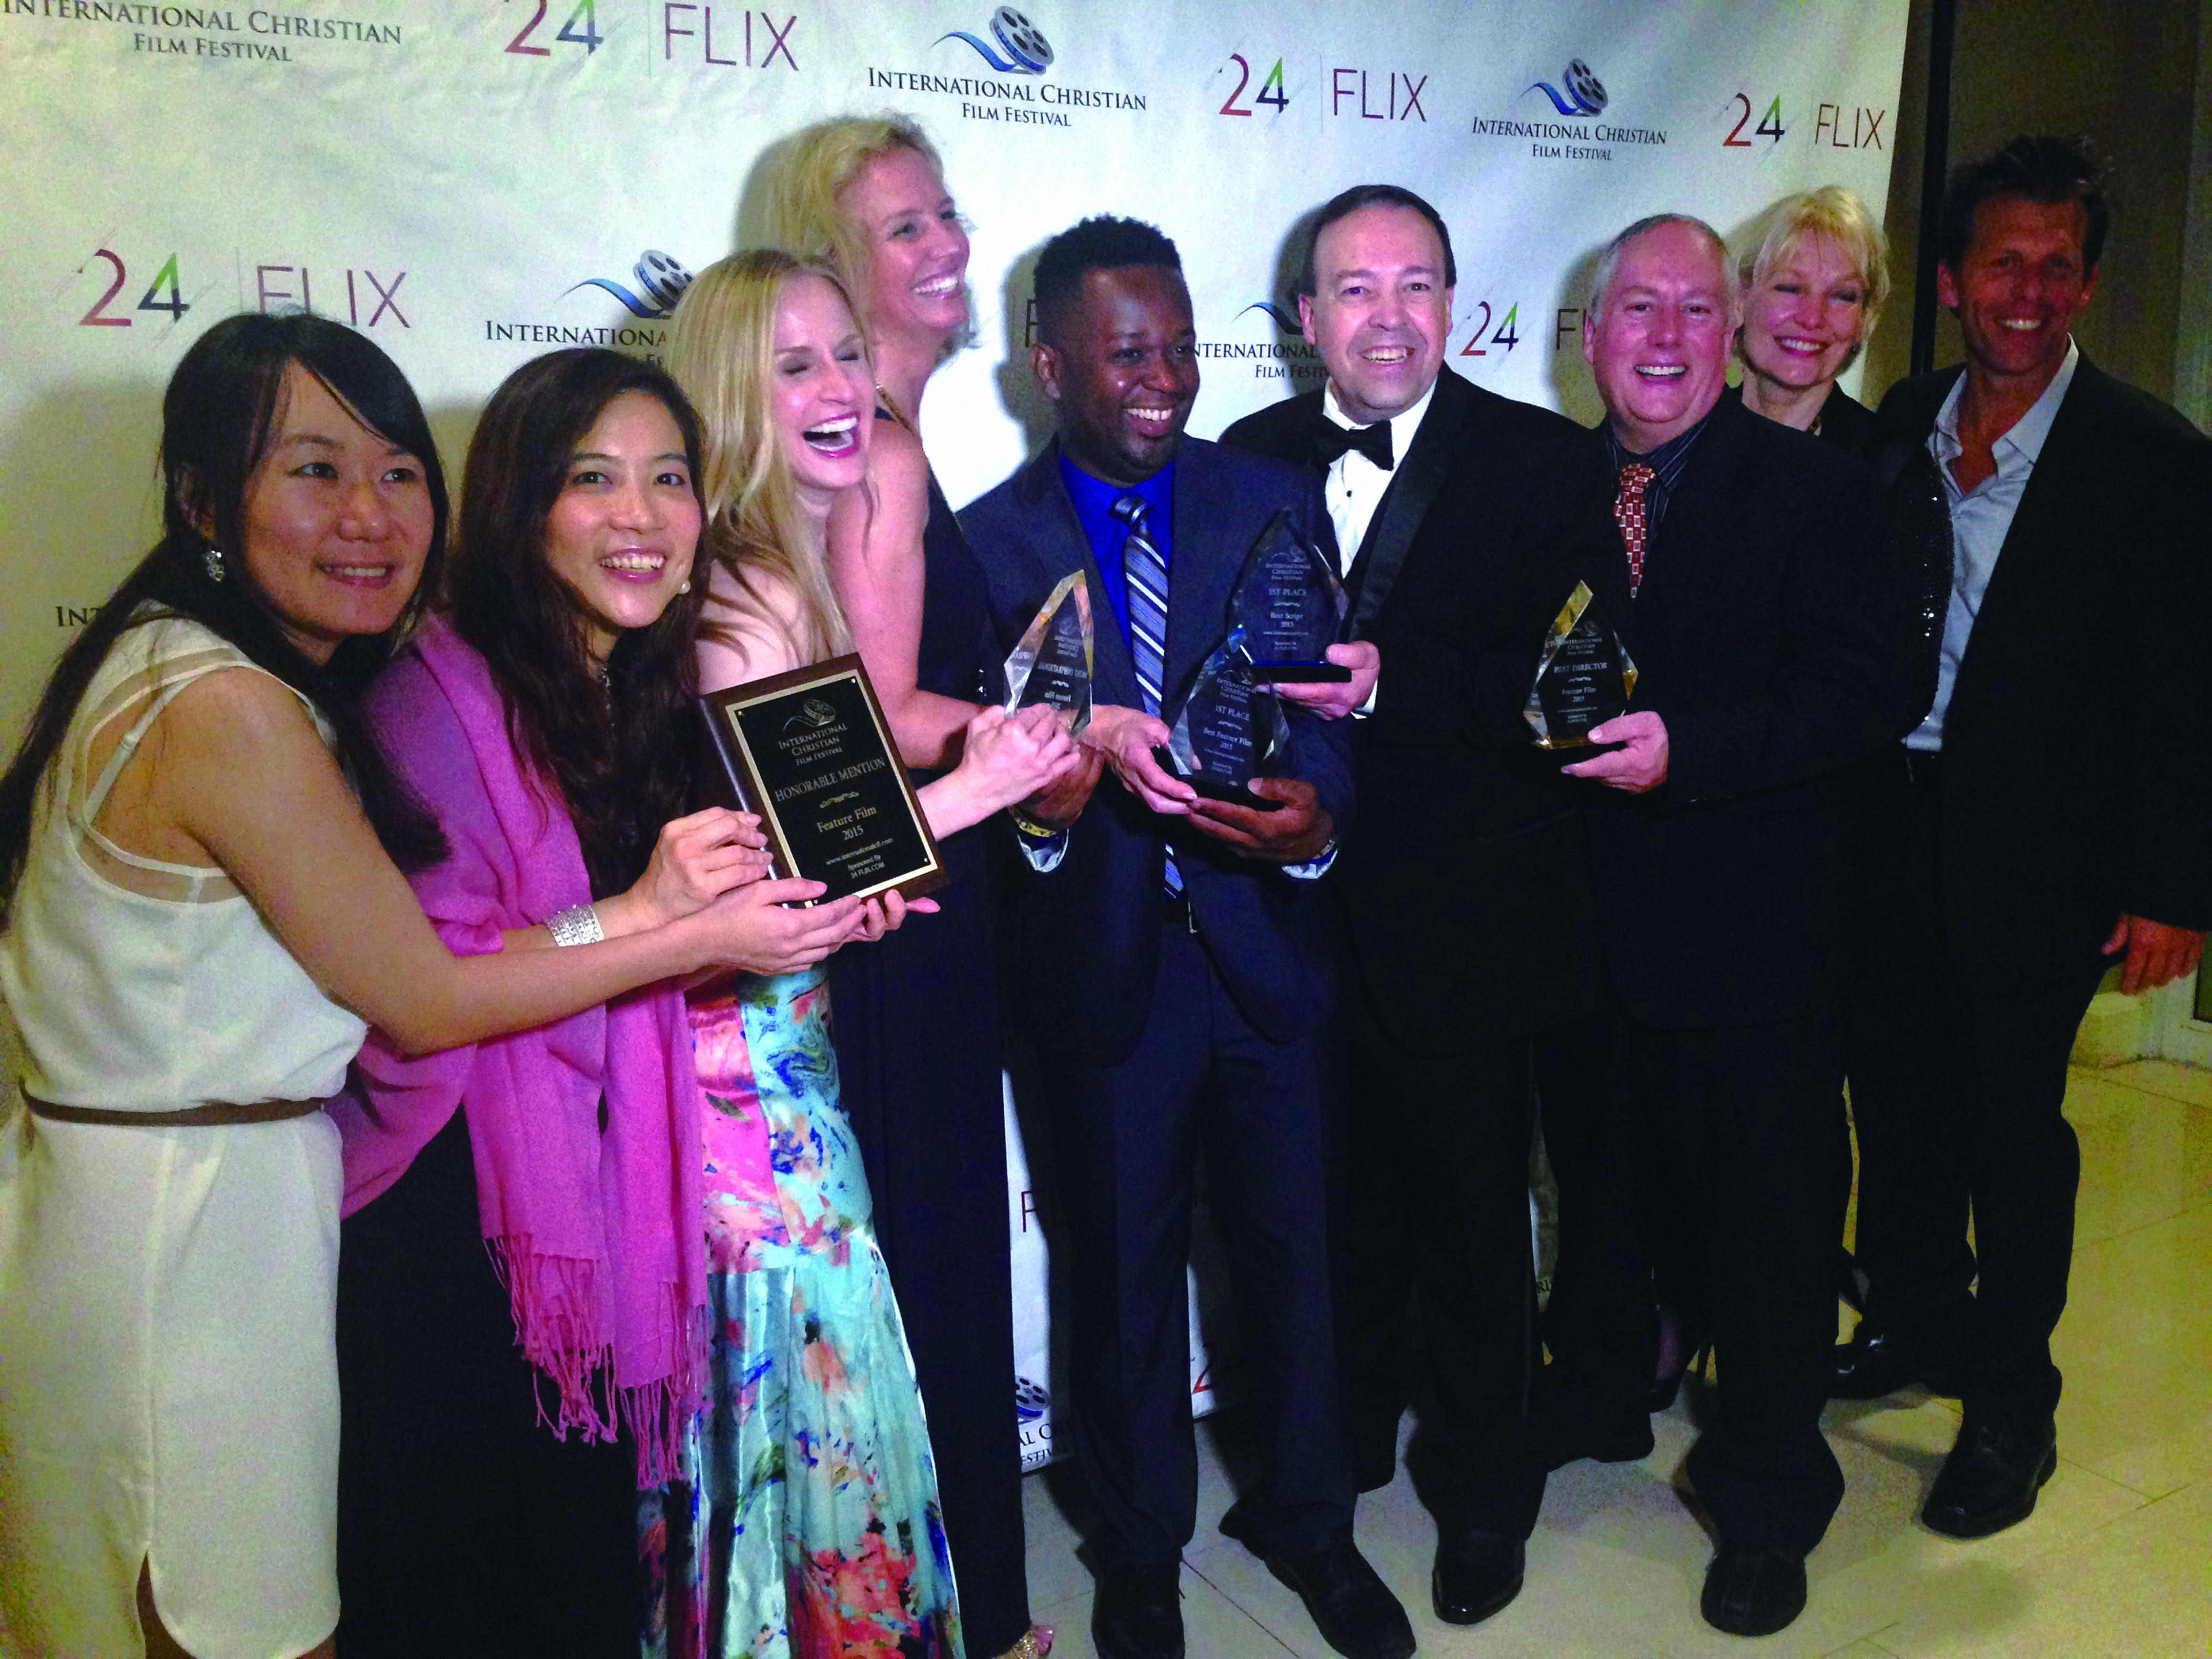 ICFF執行董事Marty Jean-Louis中(中)與其他得獎單位代表分享獲獎喜悅。